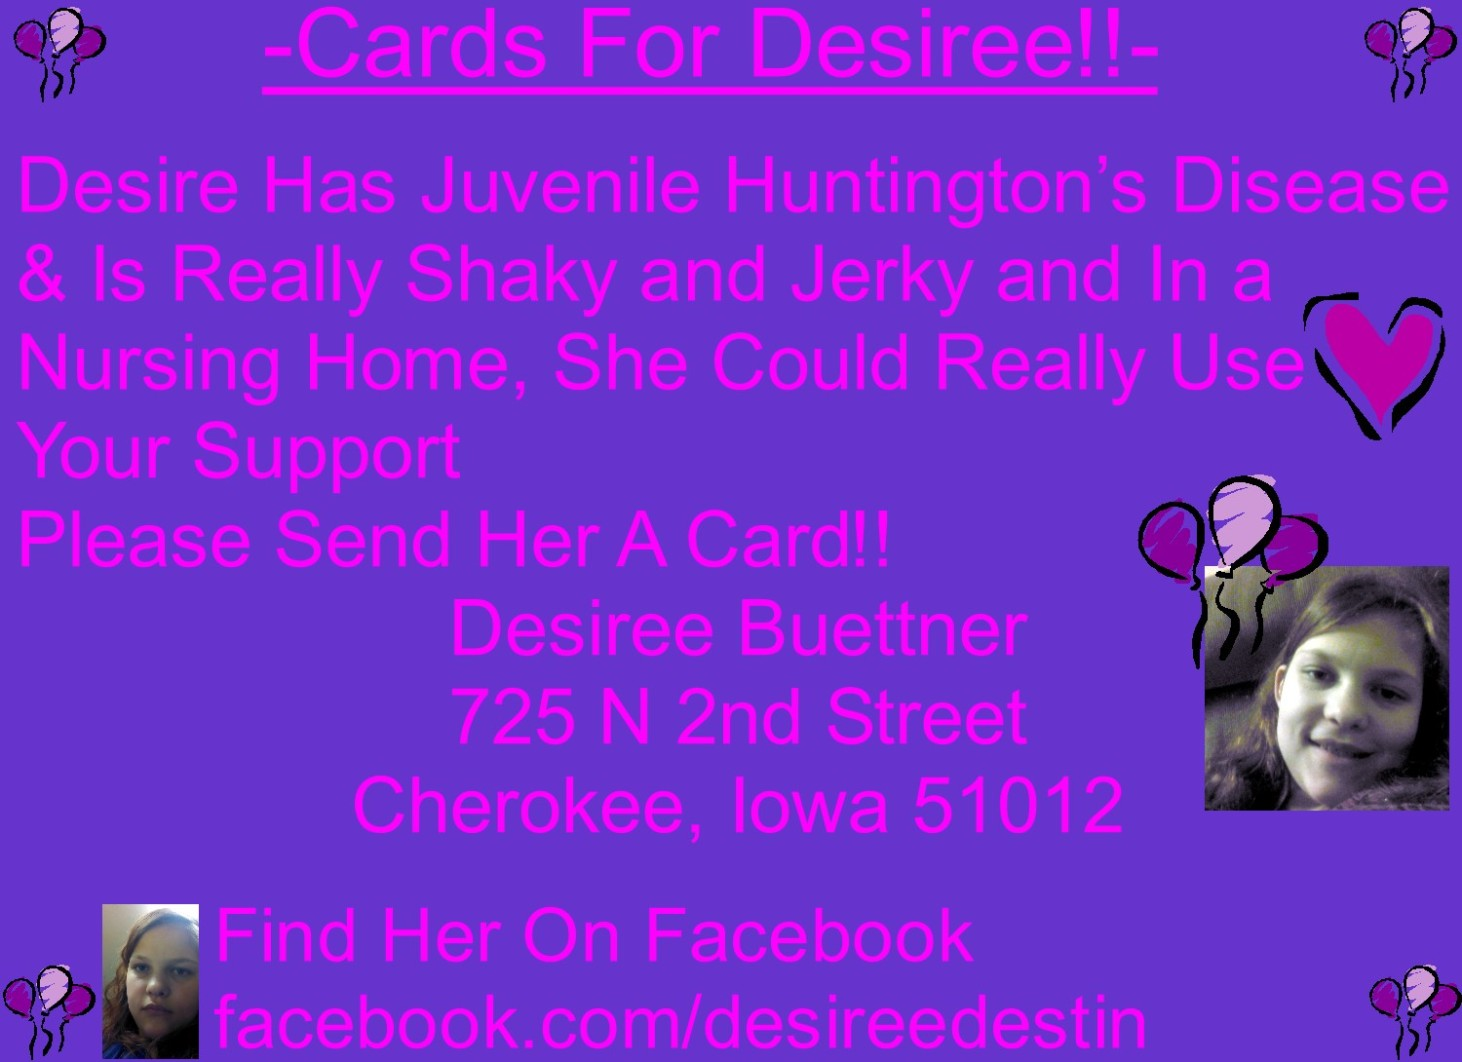 send cards.jpg